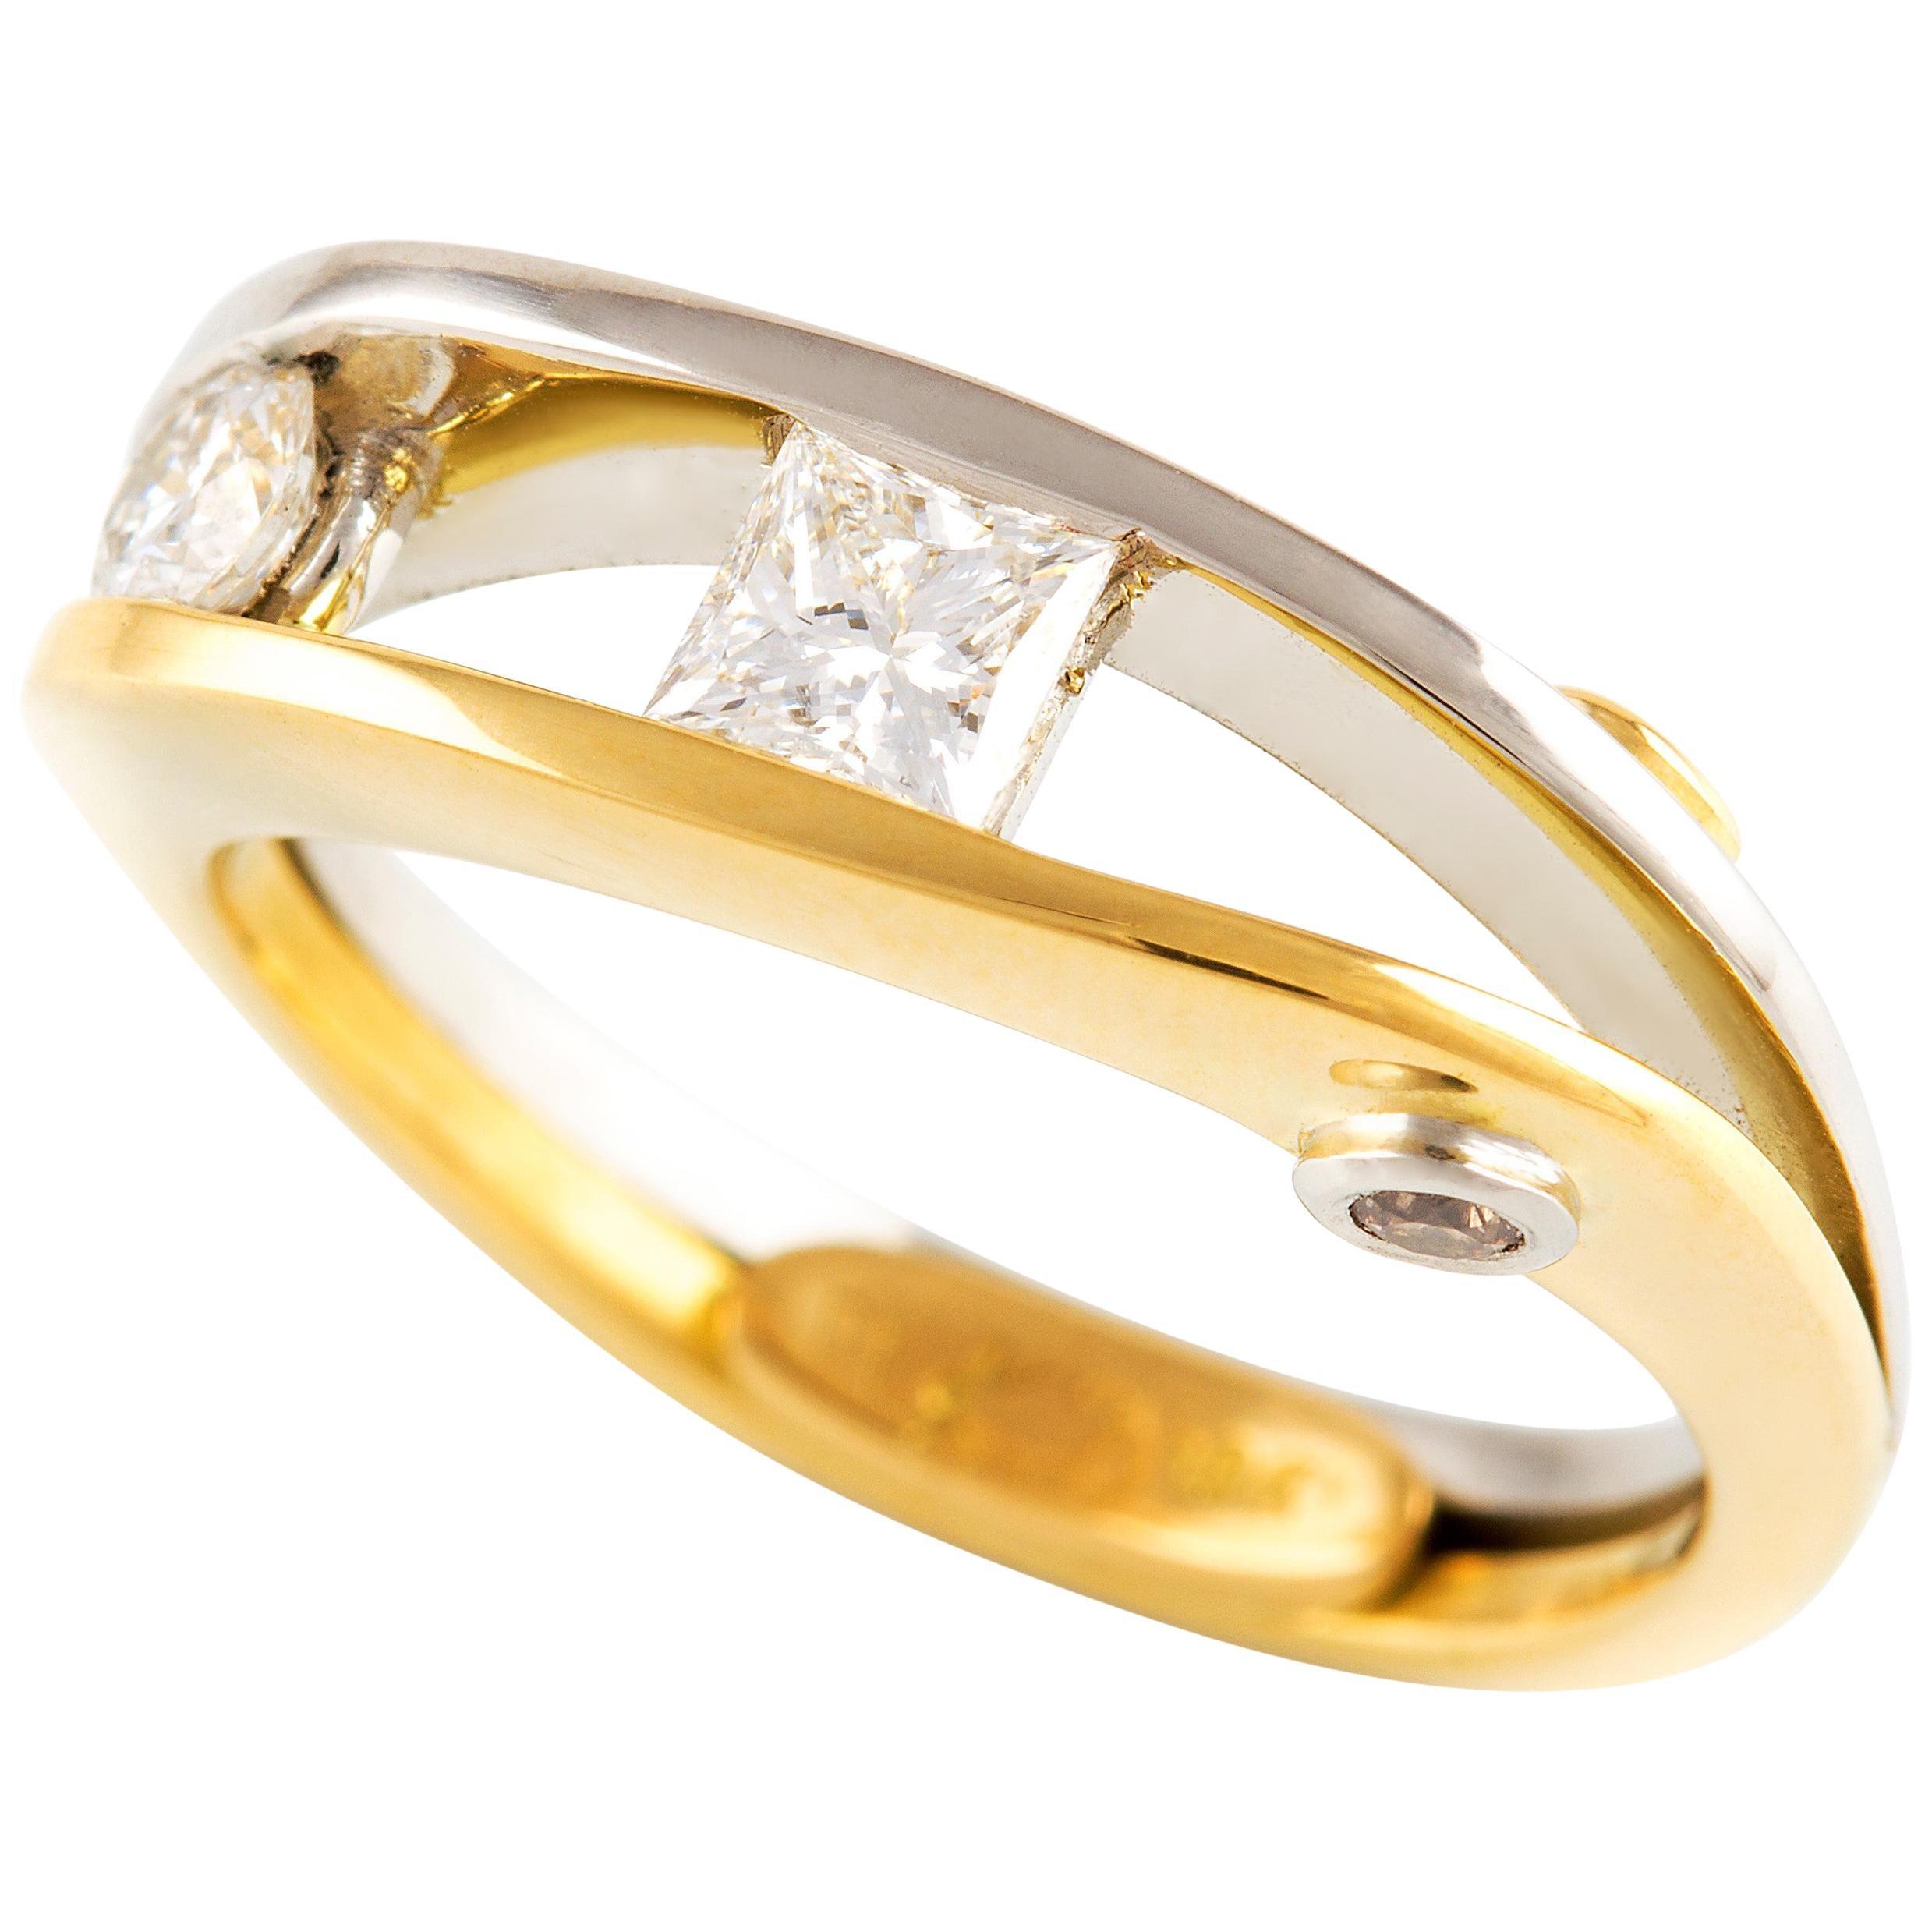 Kian Design Diamond Engagement Ring in Platinum and 18 Carat Yellow Gold